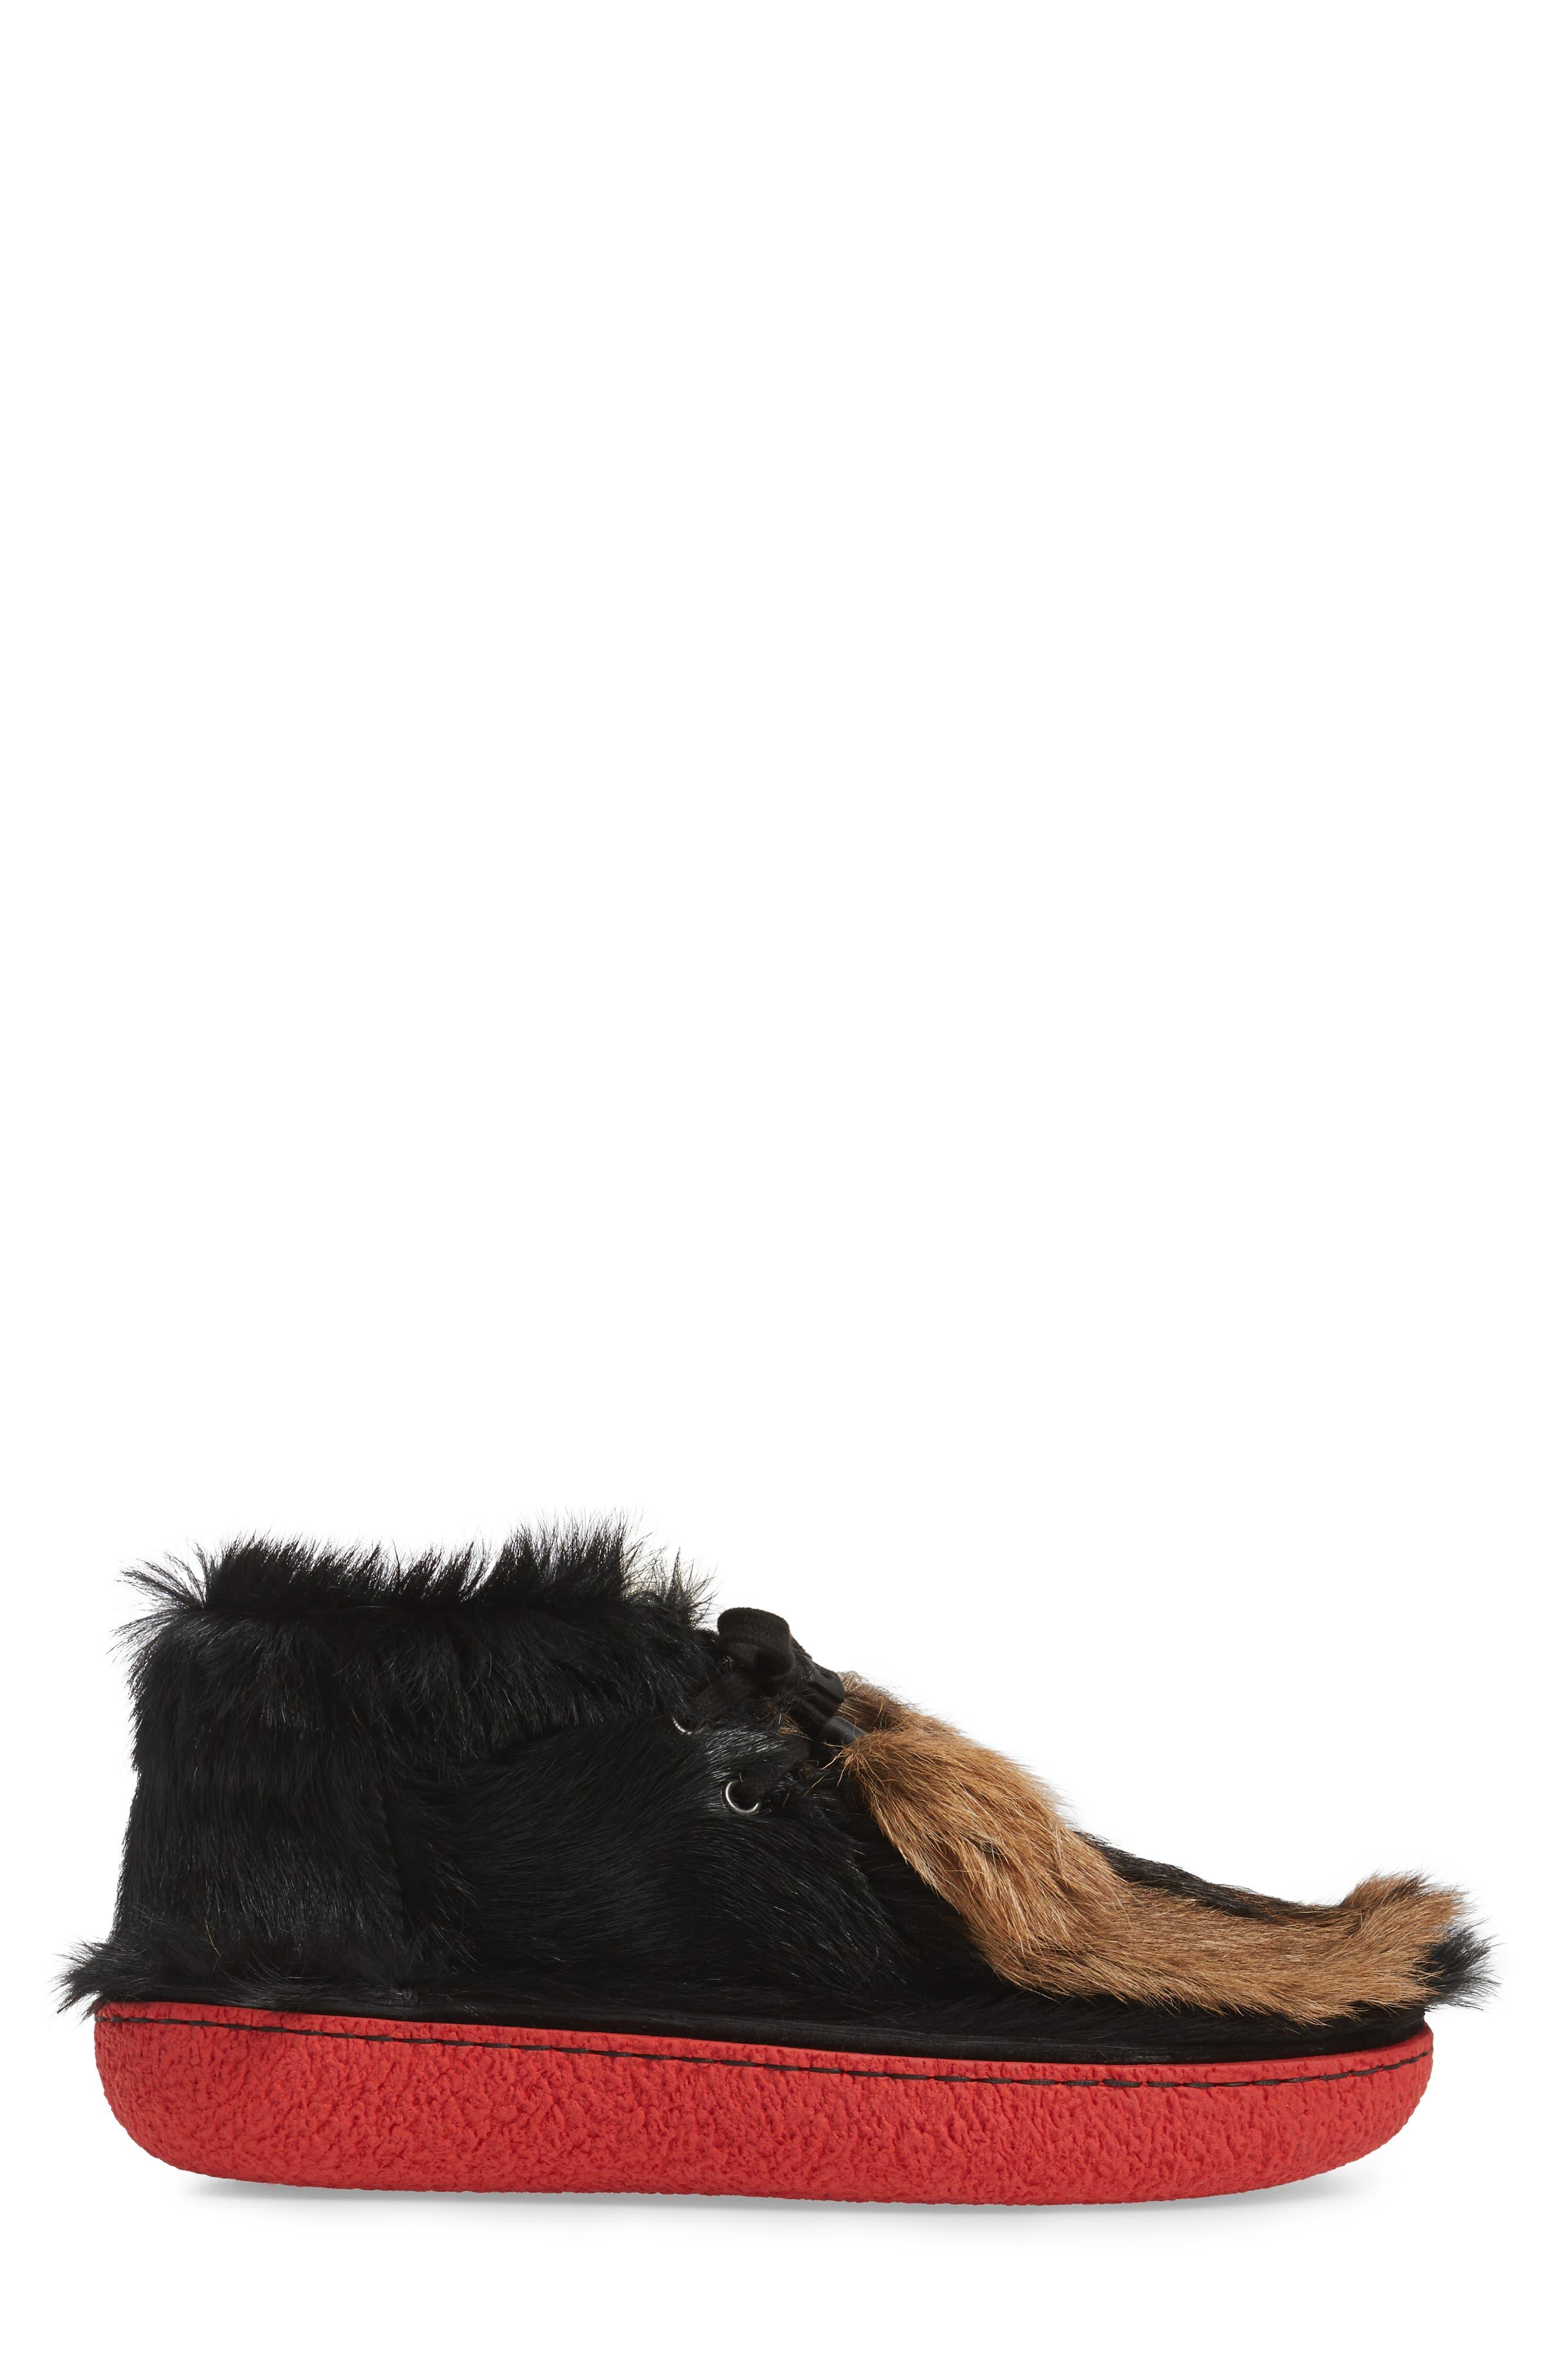 Genuine Calf and Goat Hair Chukka Boot,                             Alternate thumbnail 3, color,                             001